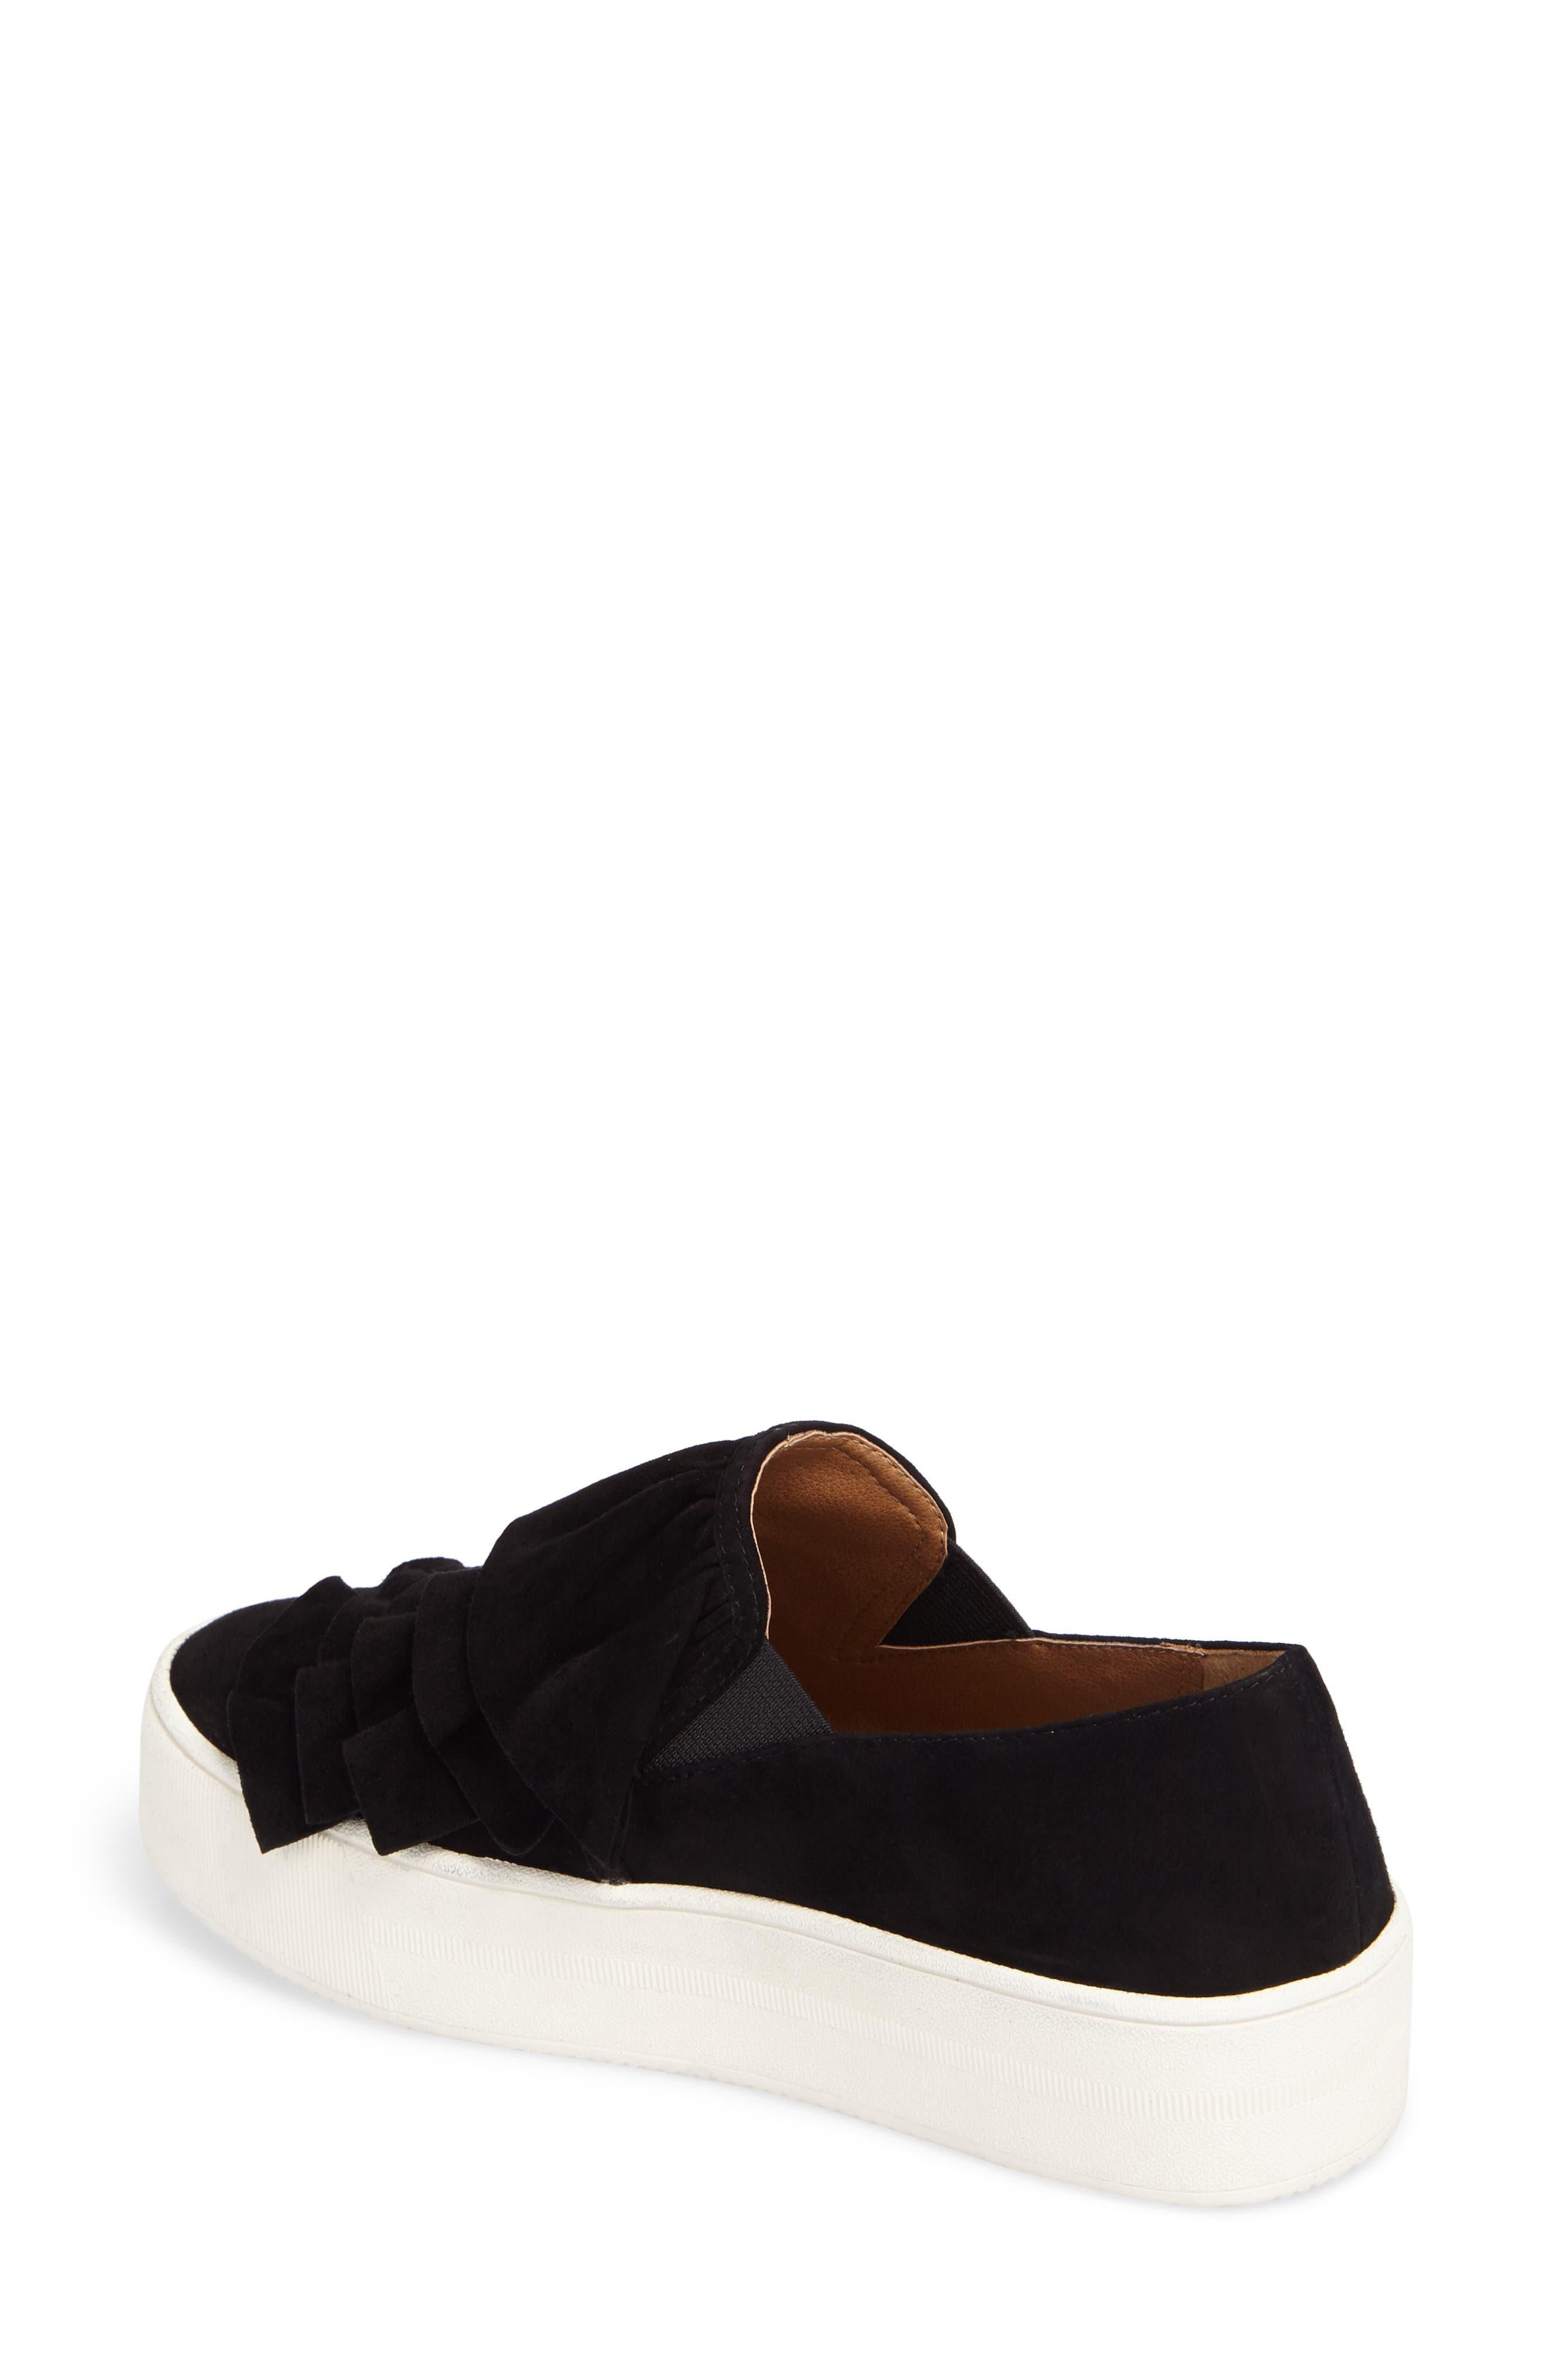 Marian Platform Sneaker,                             Alternate thumbnail 2, color,                             001